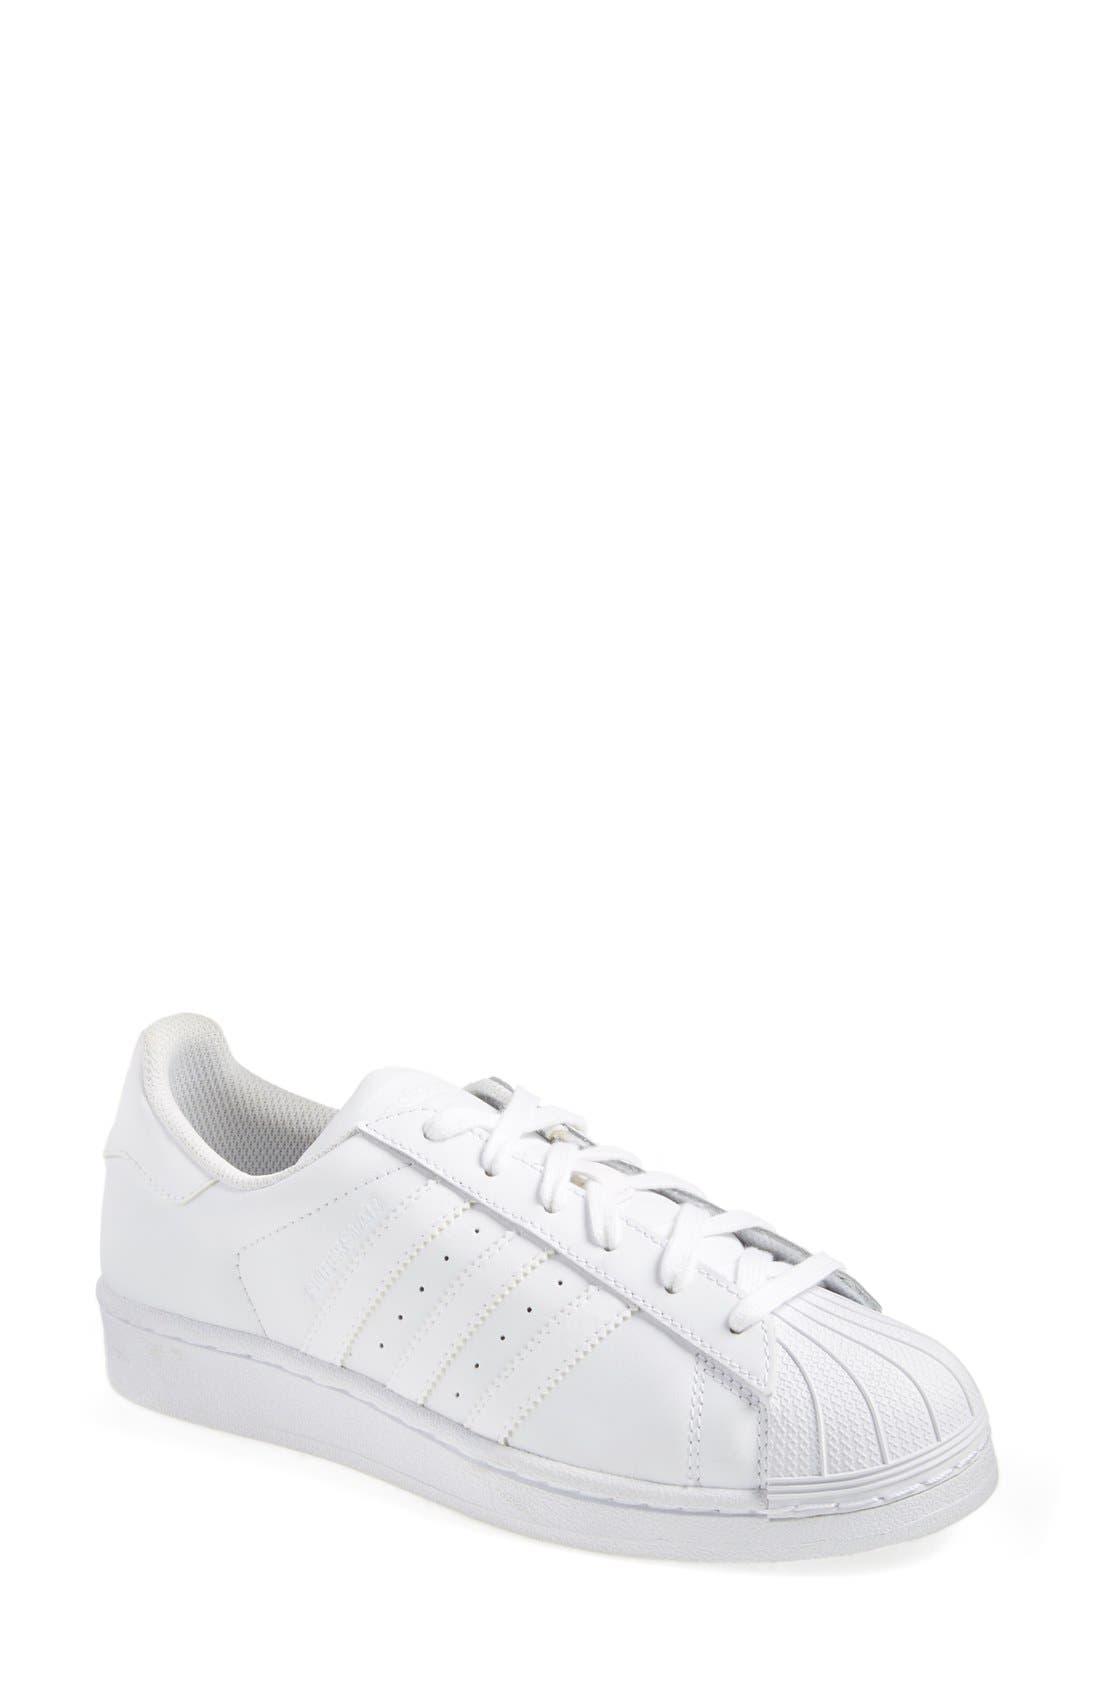 Golden Goose Deluxe Brand Black White Superstar Sneakers Farfetch